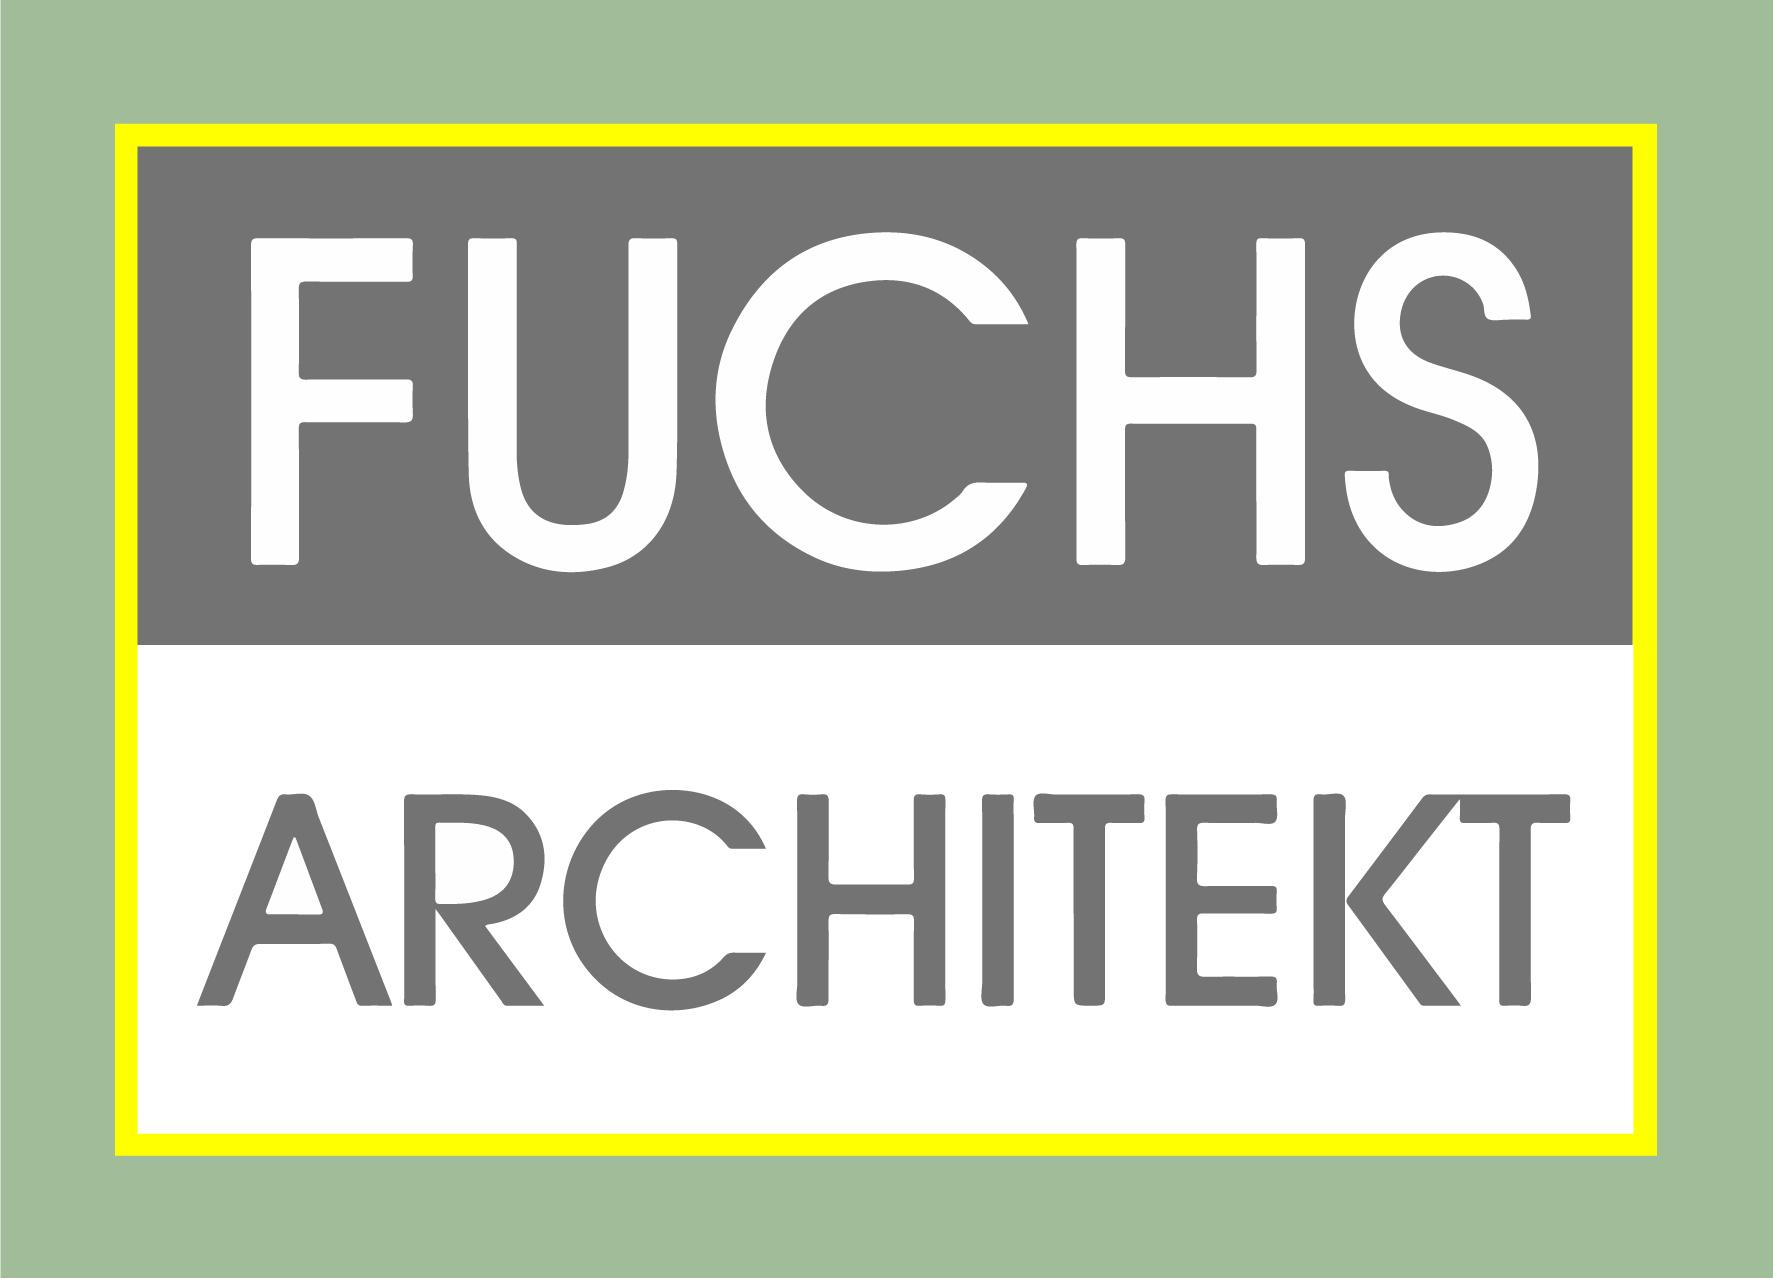 Fuchs Architekt